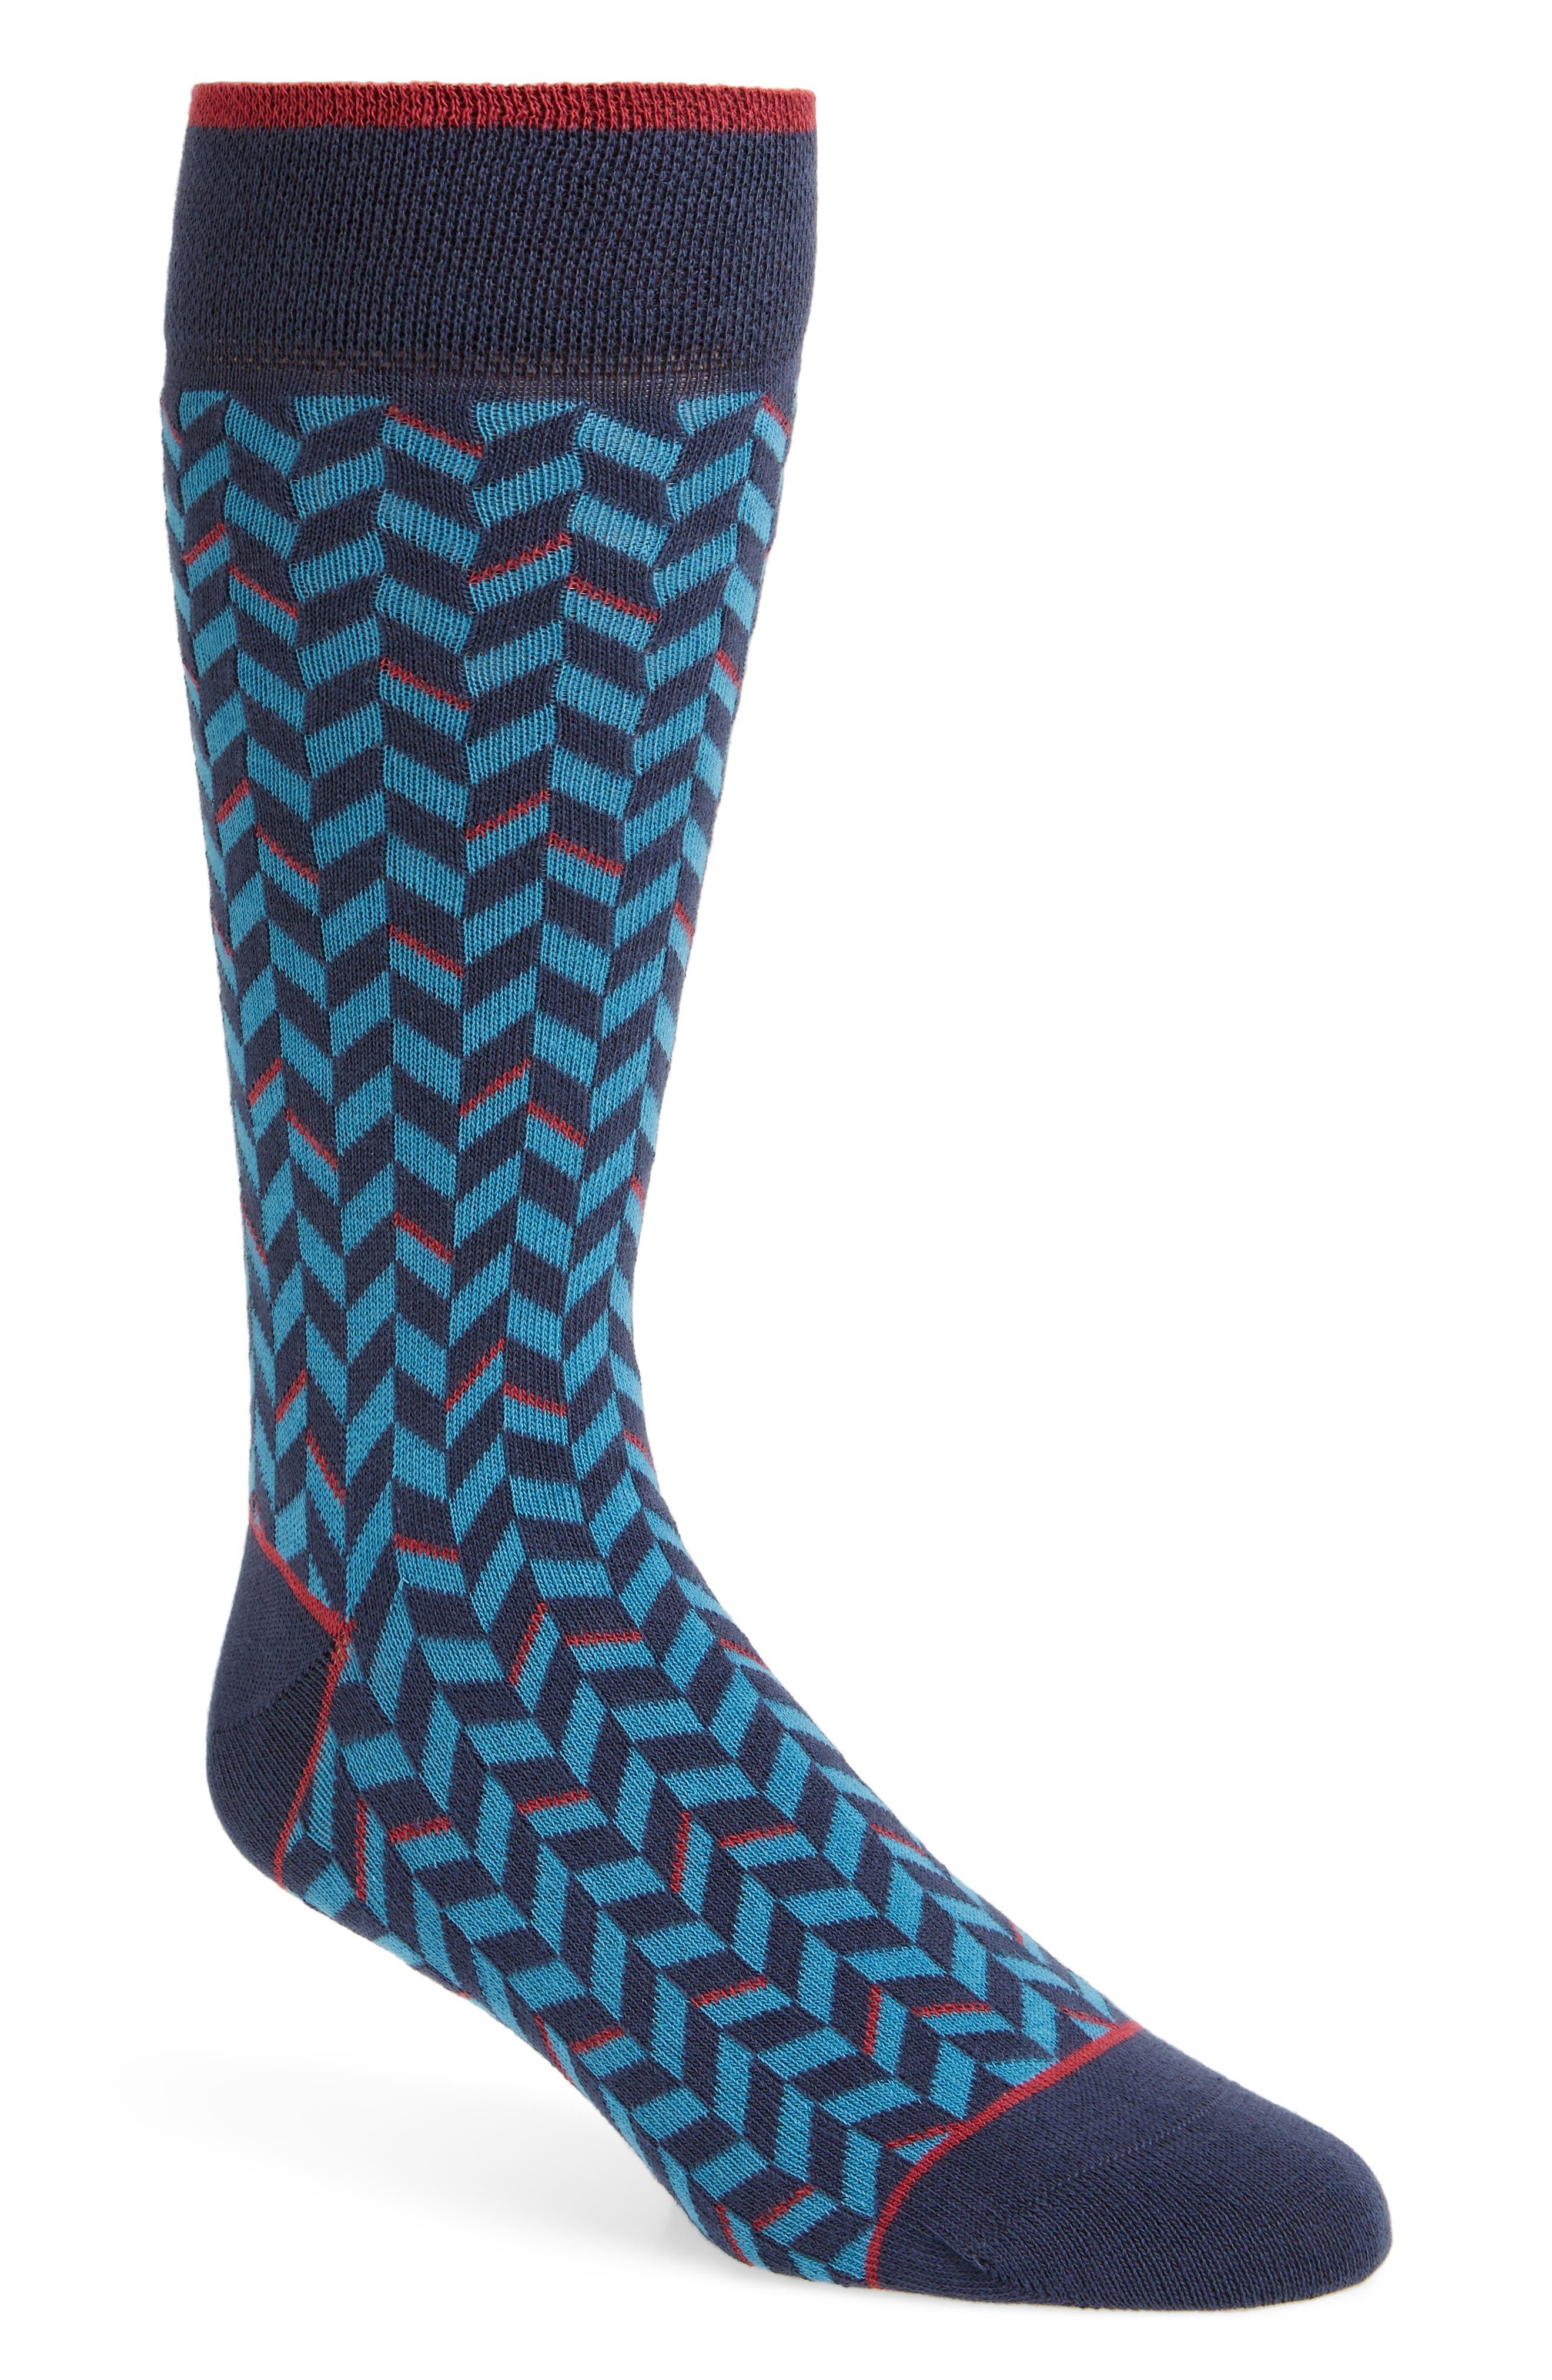 Enom Geometric Socks,                             Main thumbnail 1, color,                             410